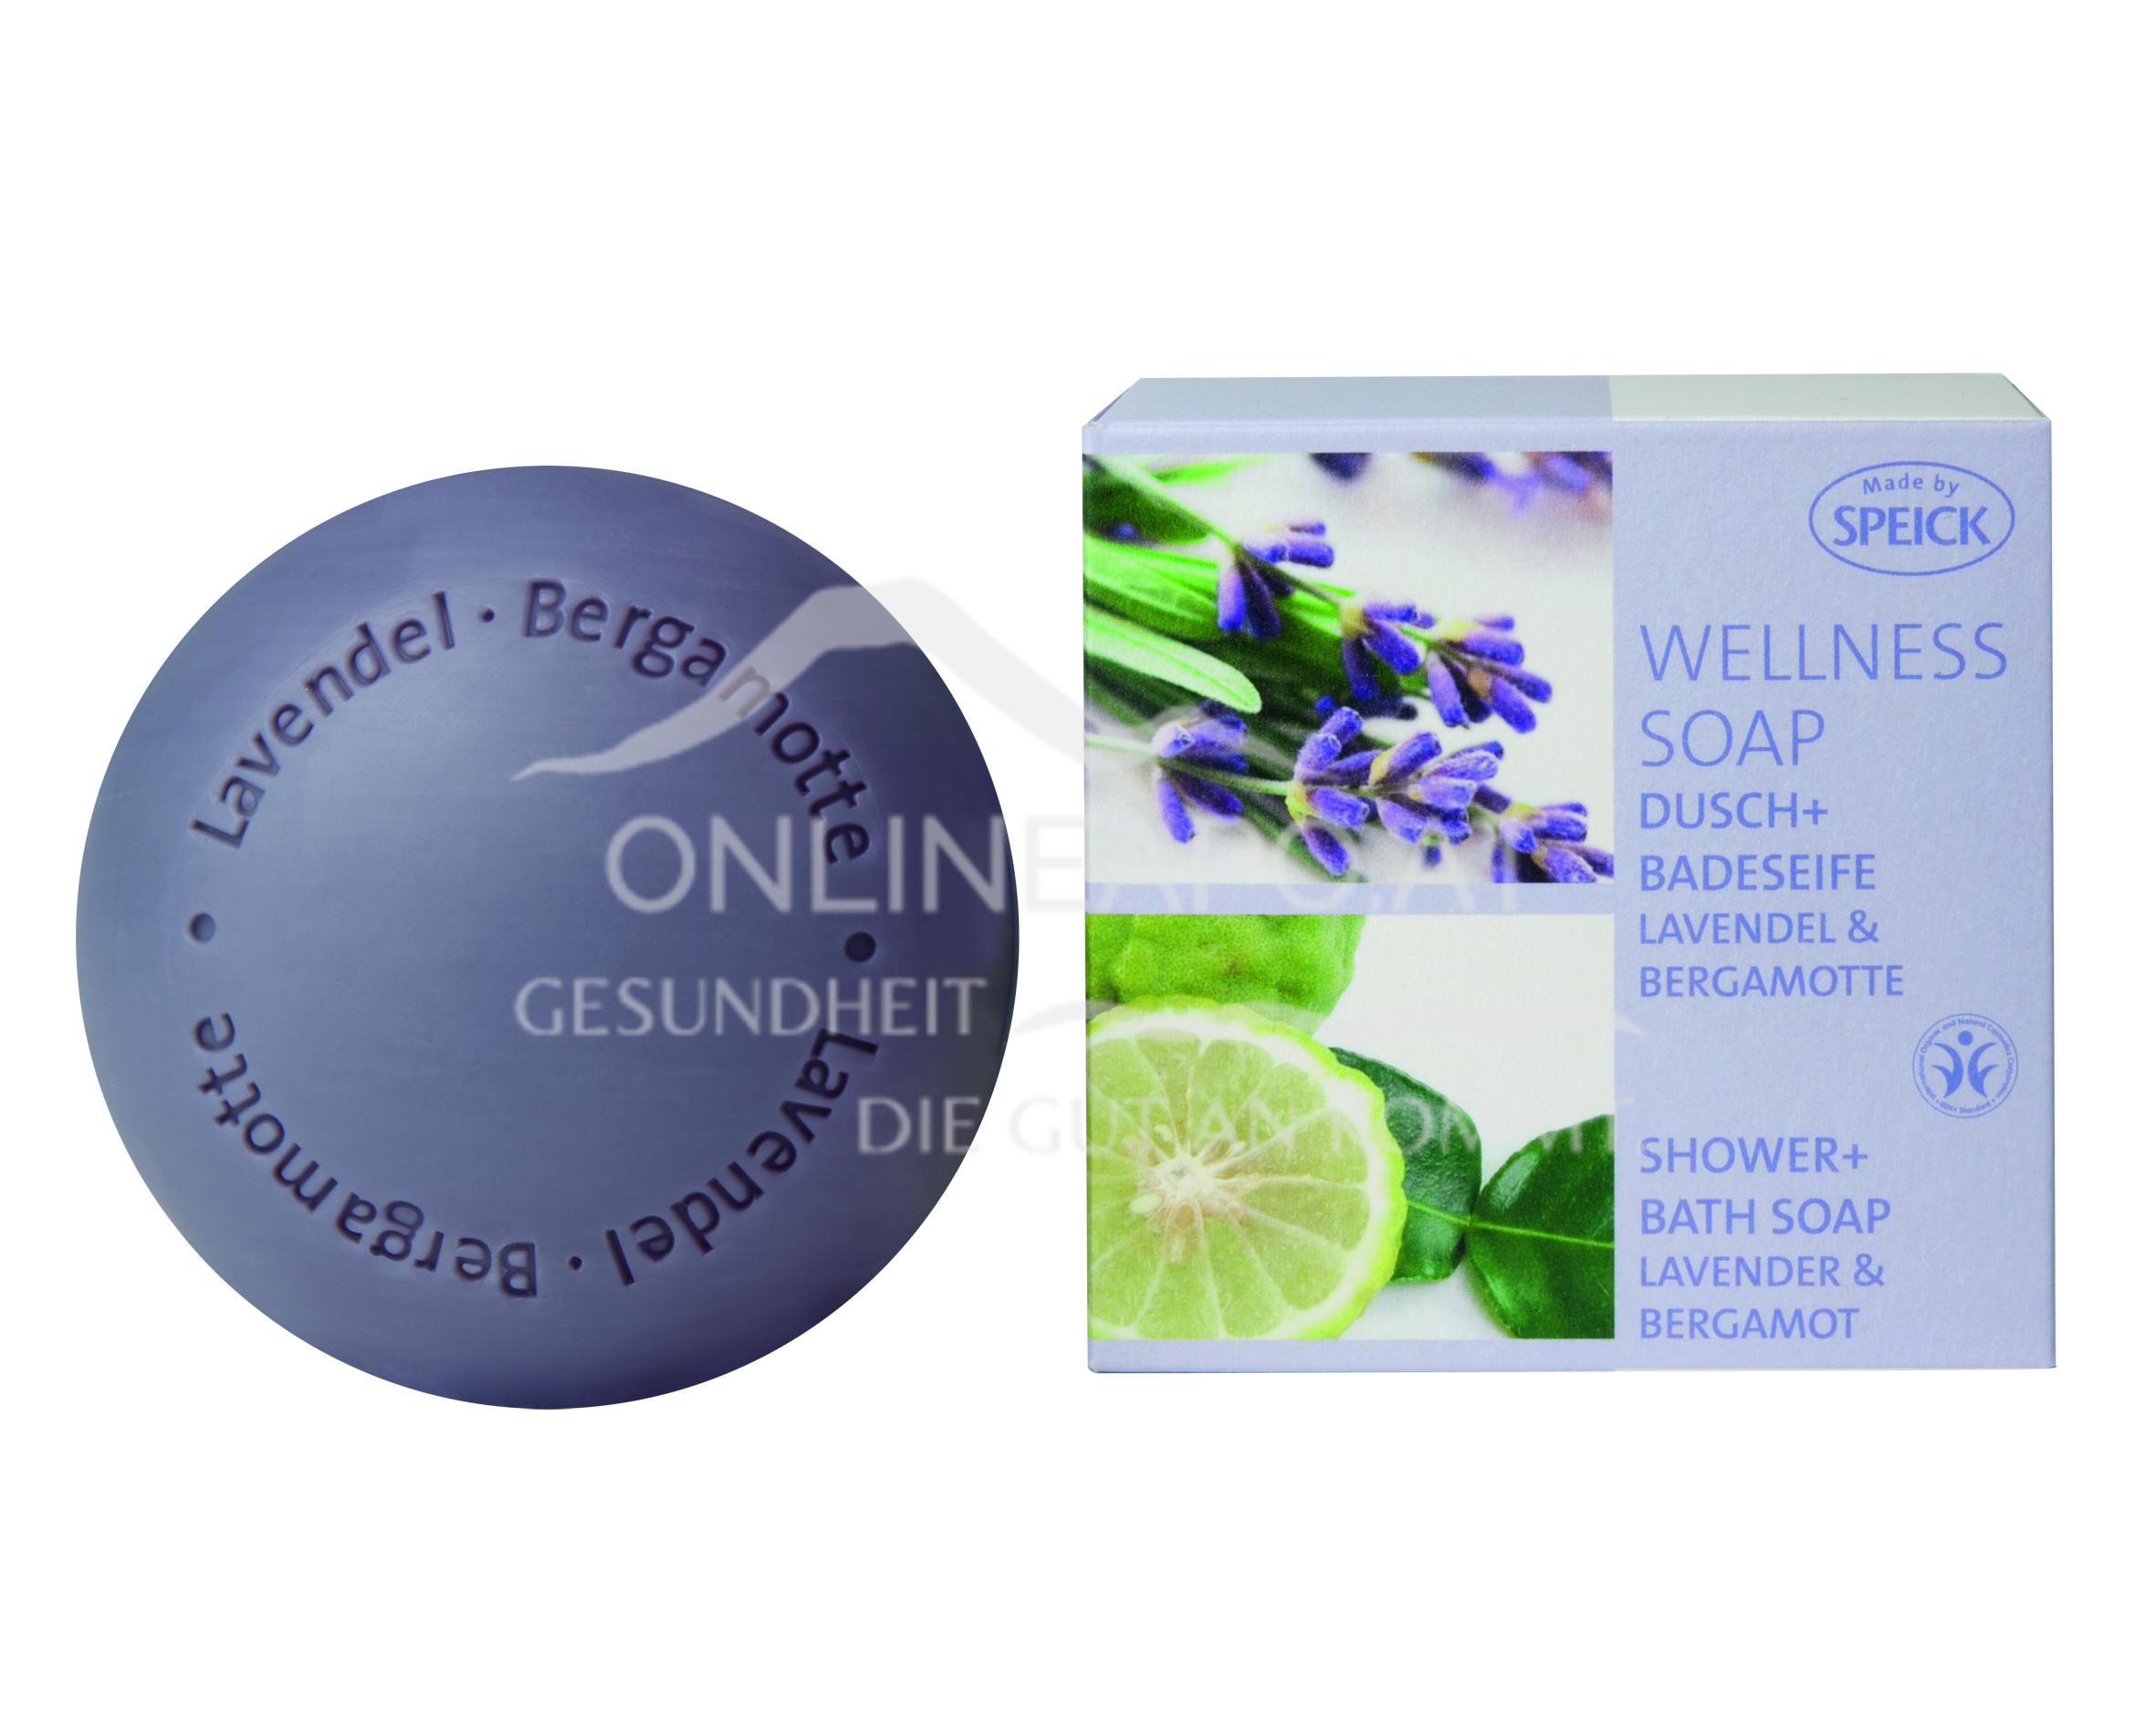 Made by Speick Wellness Soap Lavendel & Bergamotte